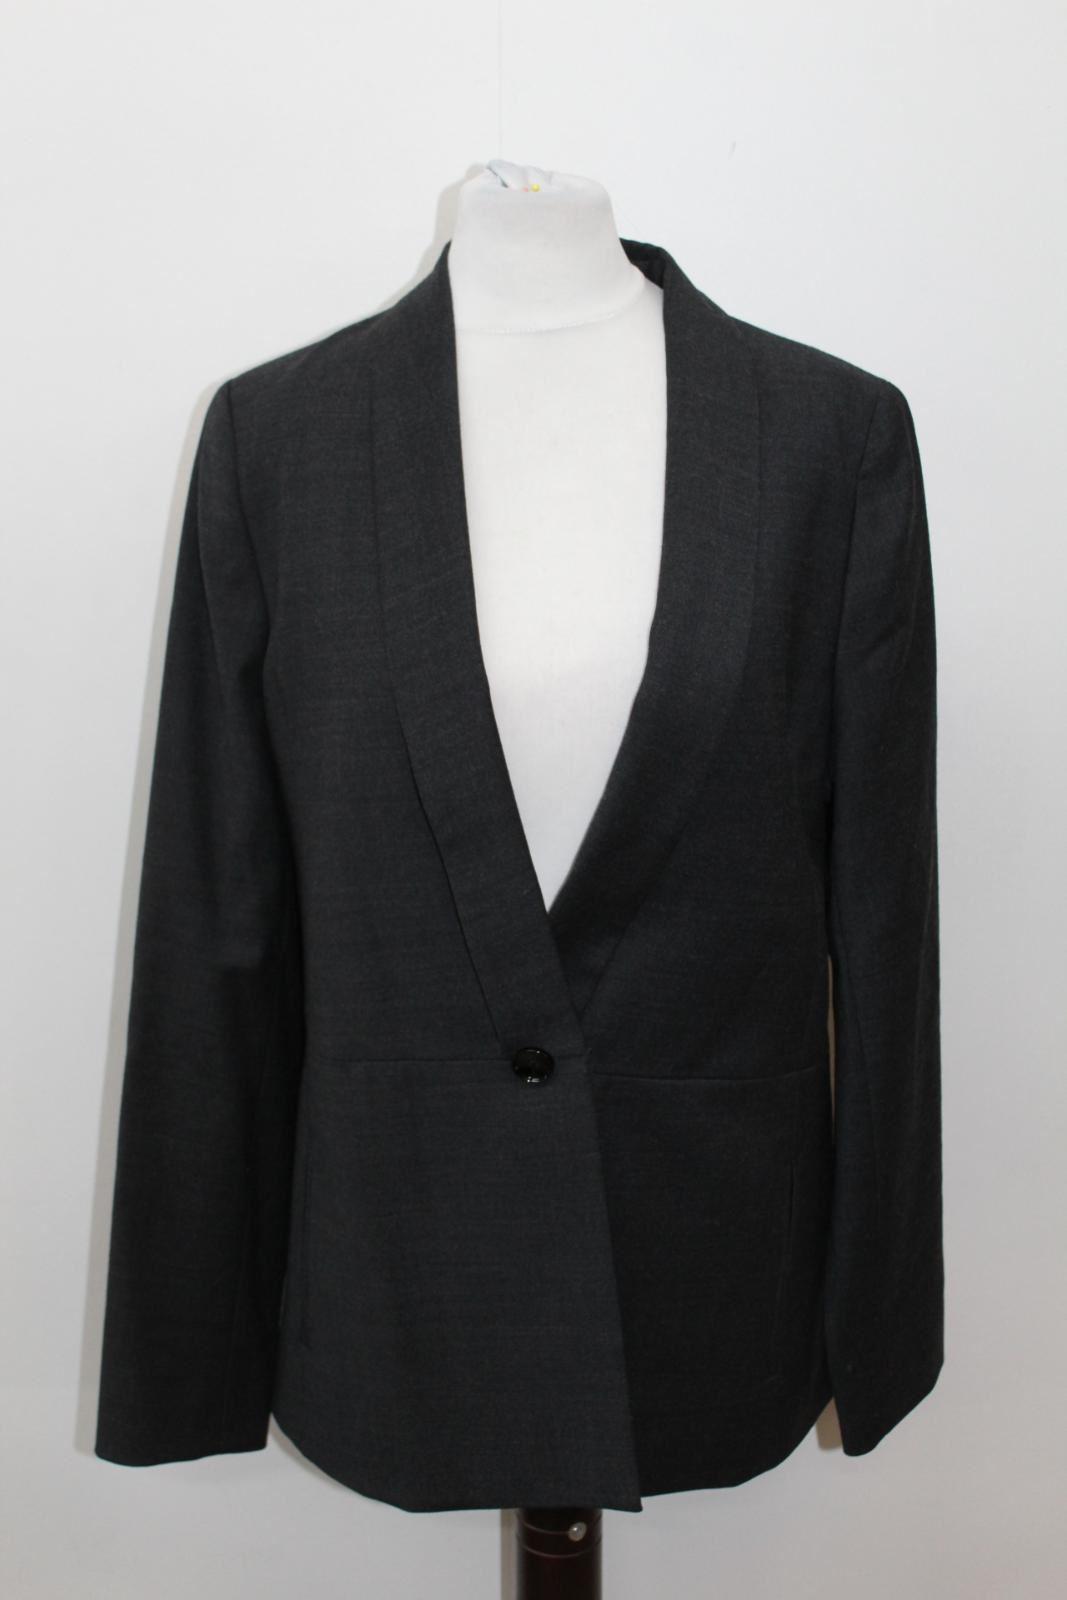 AEGER-Ladies-Grey-Wool-Blend-Single-Breasted-Blazer-Jacket-UK8-EU36-BNWT